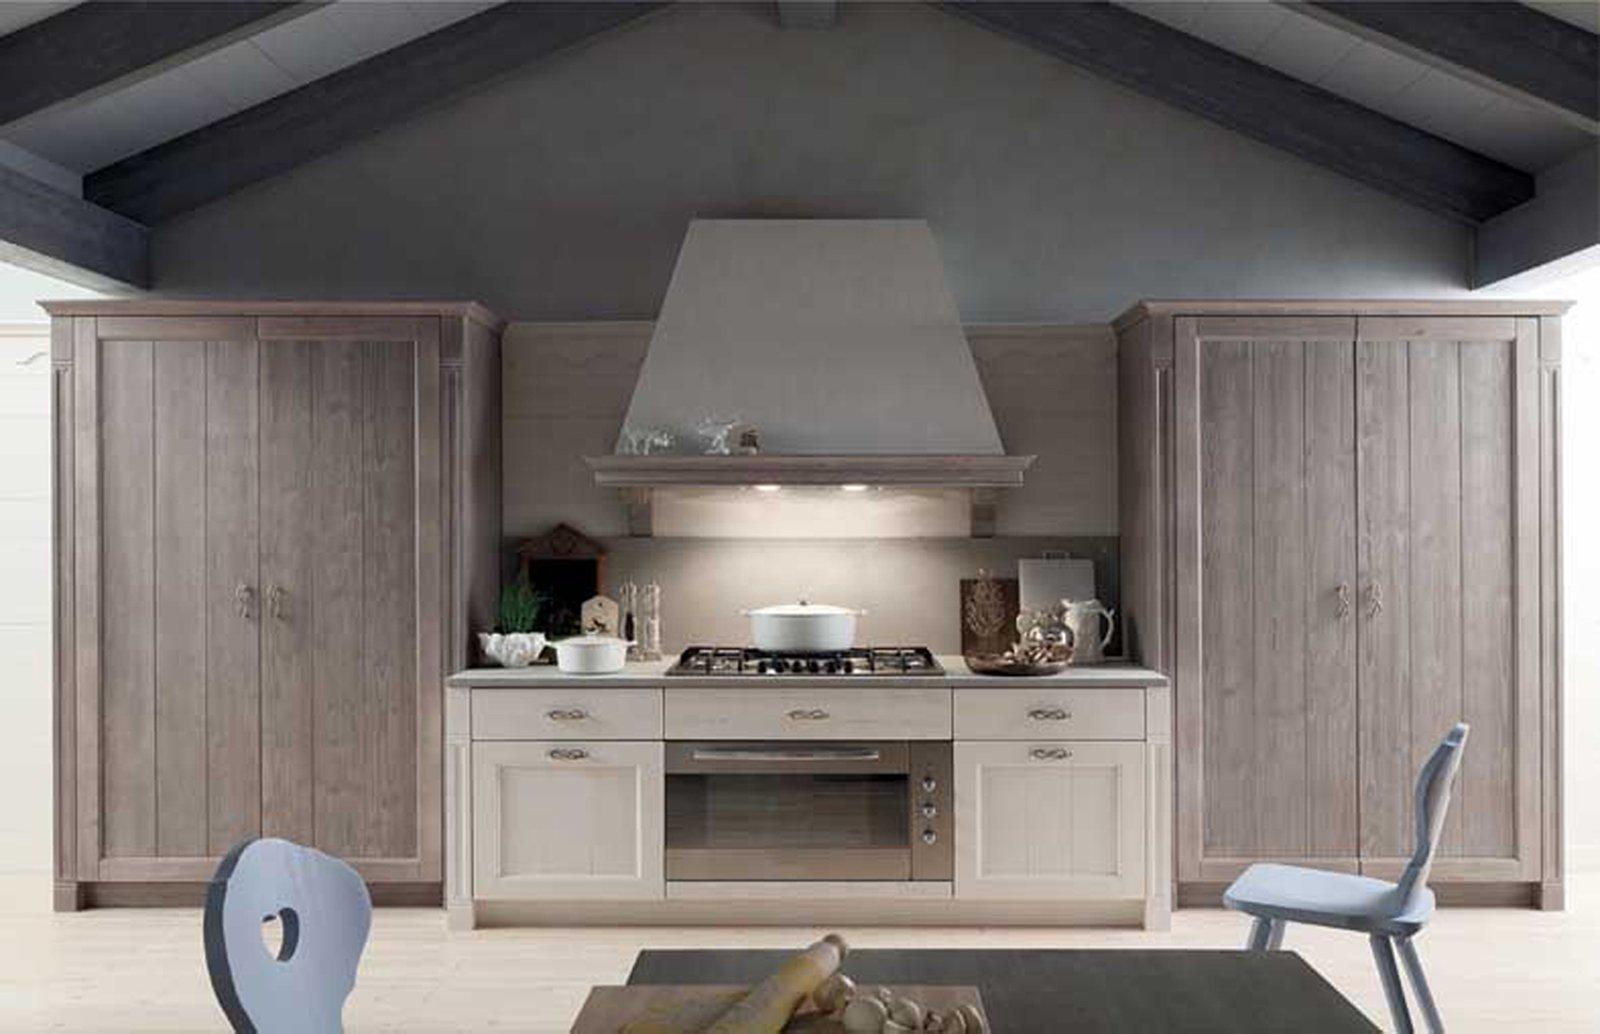 Emejing Maniglie Per Cucina Ikea Gallery - Home Interior Ideas ...